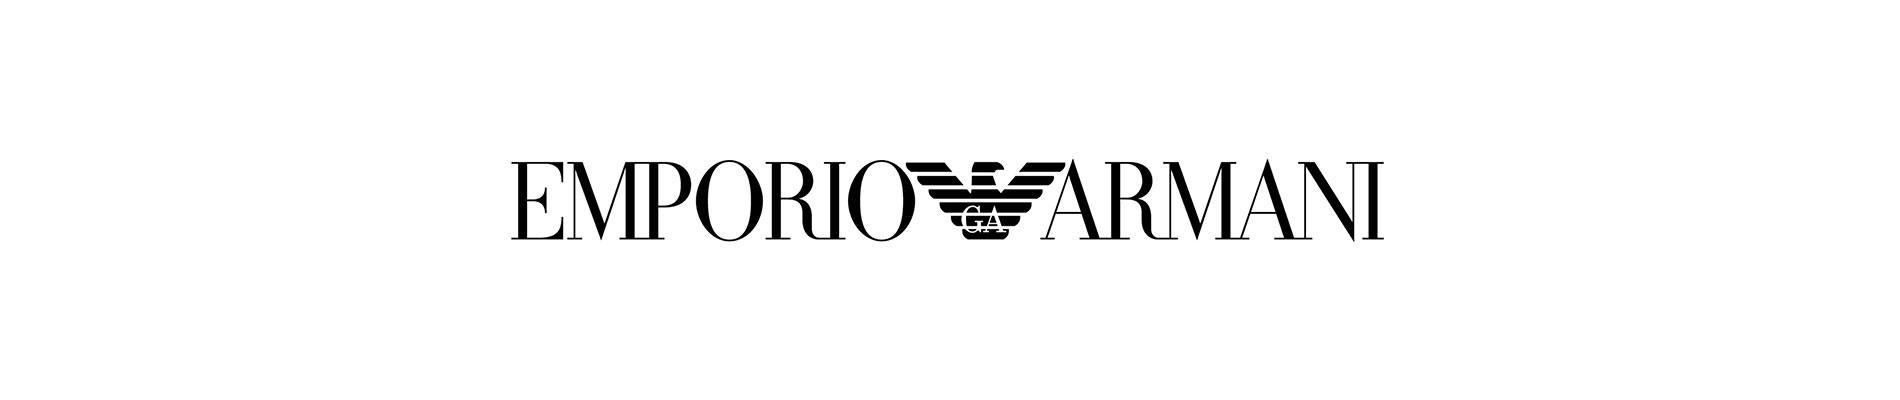 emporio armani designer frames header logo